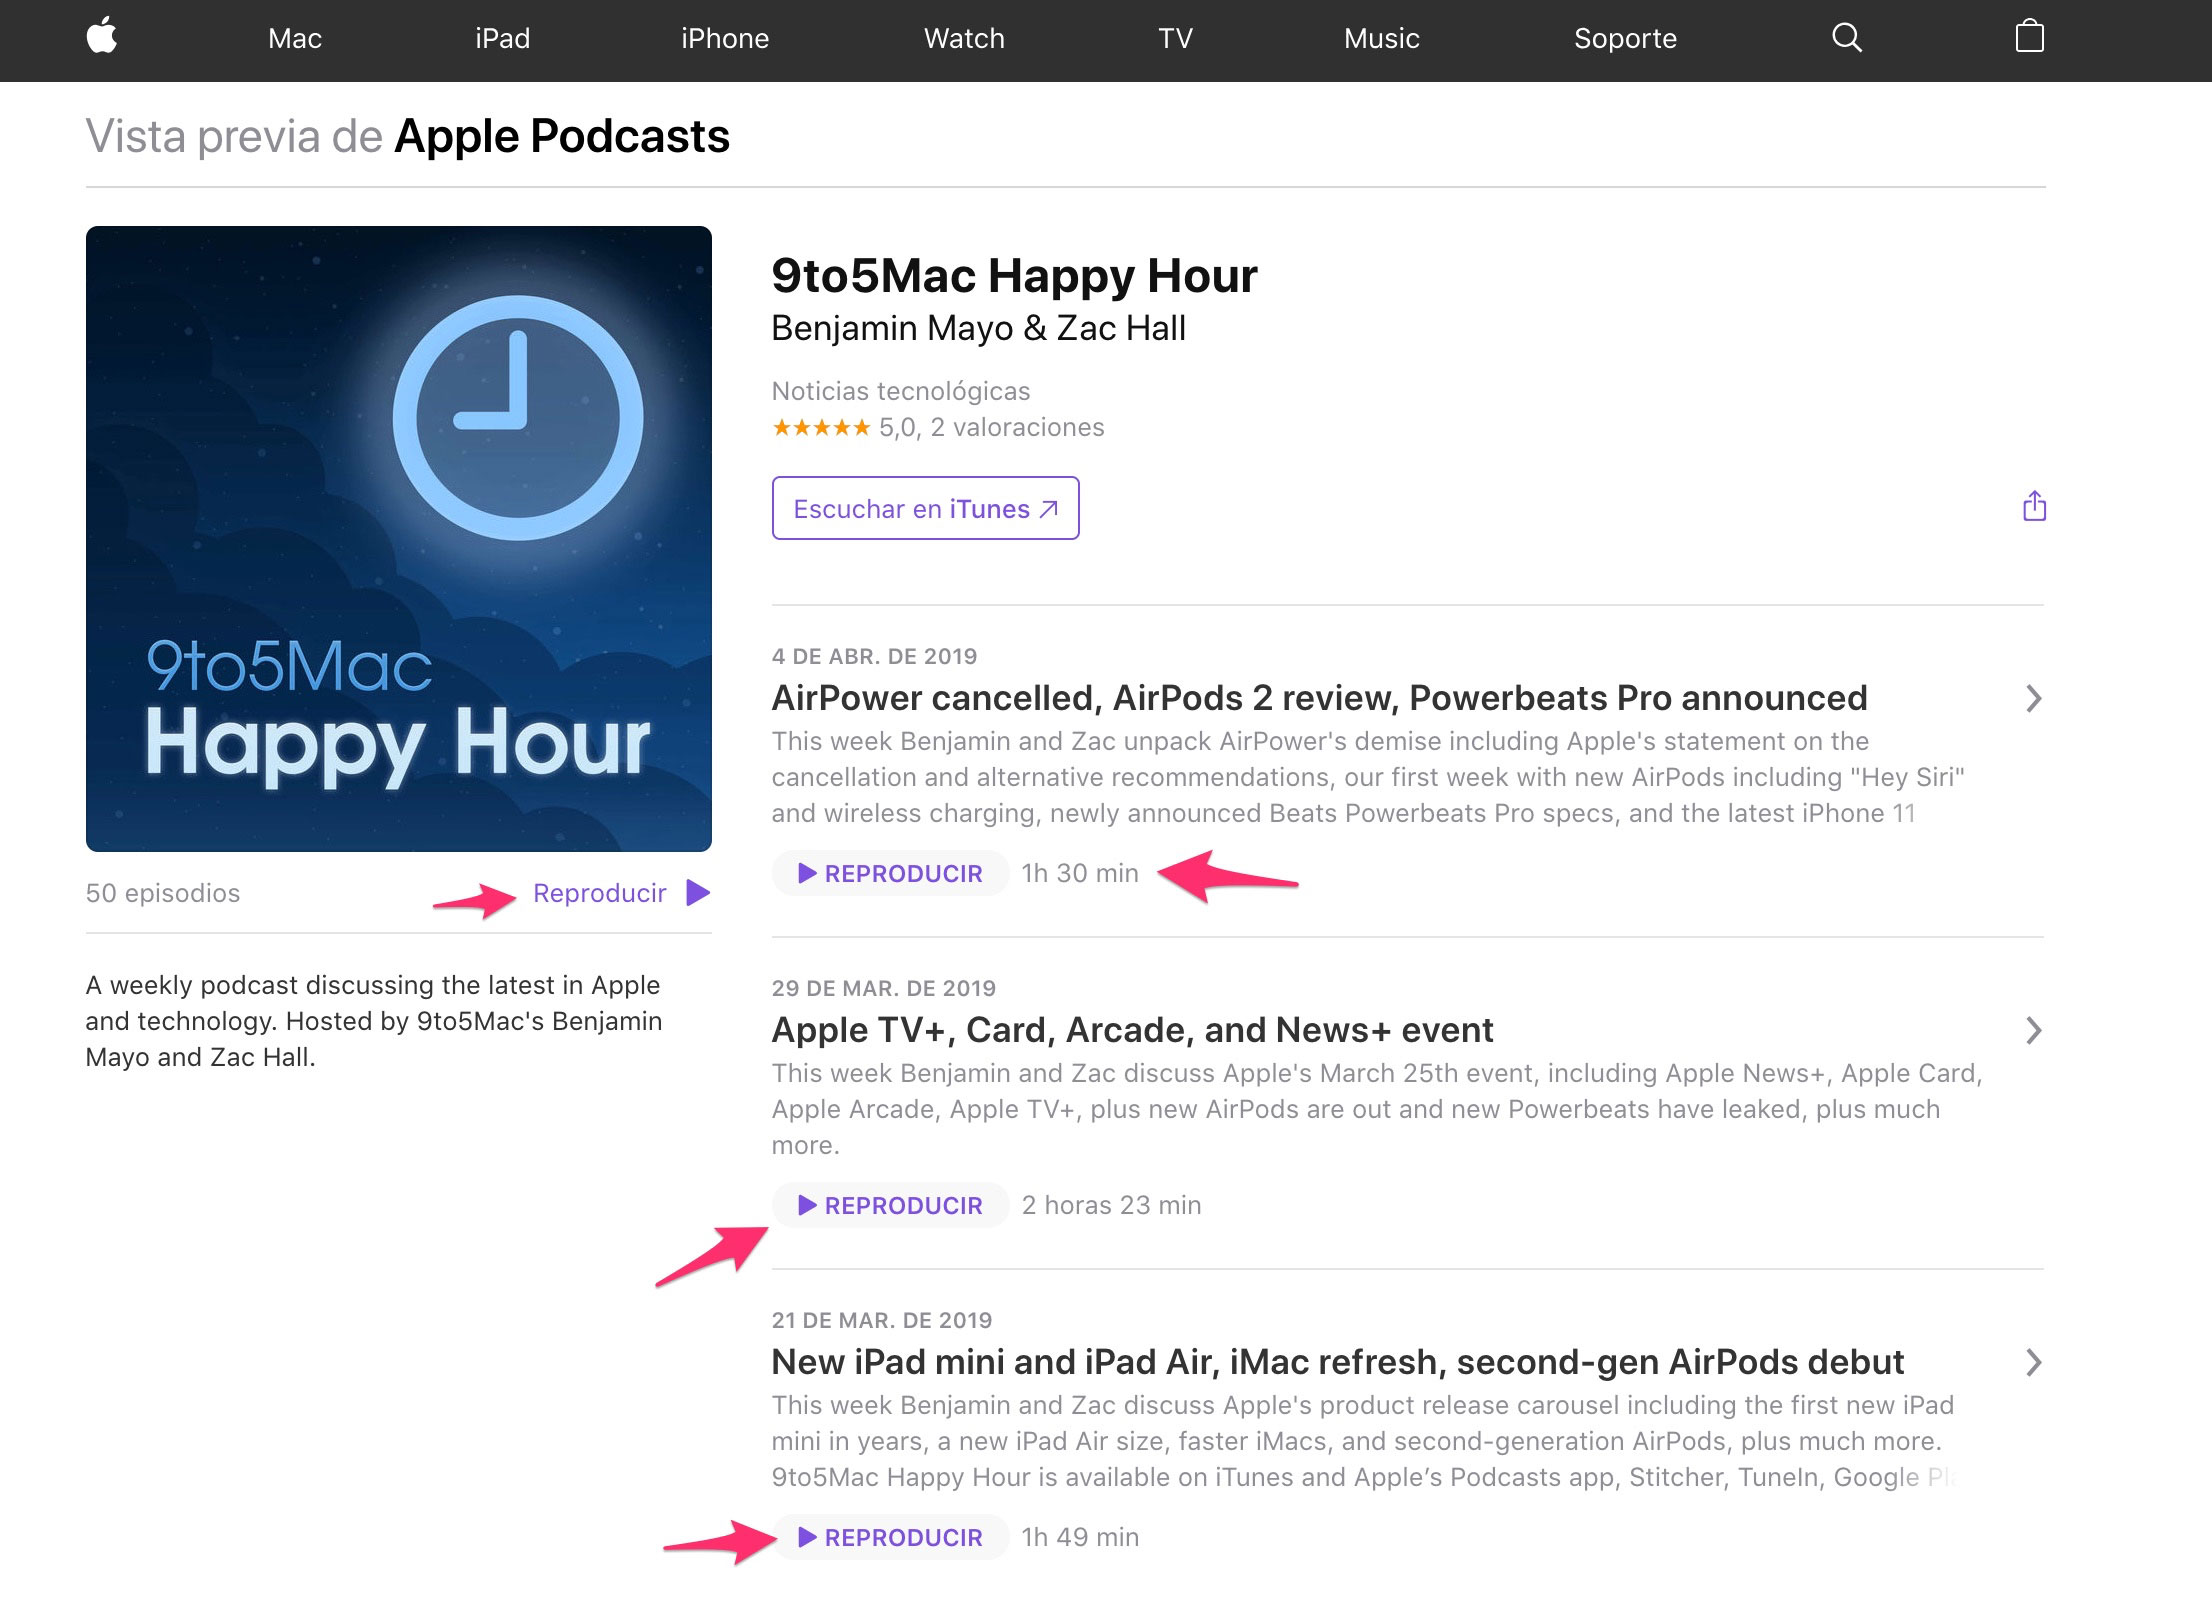 Podcast de 9to5Mac con reproducción web